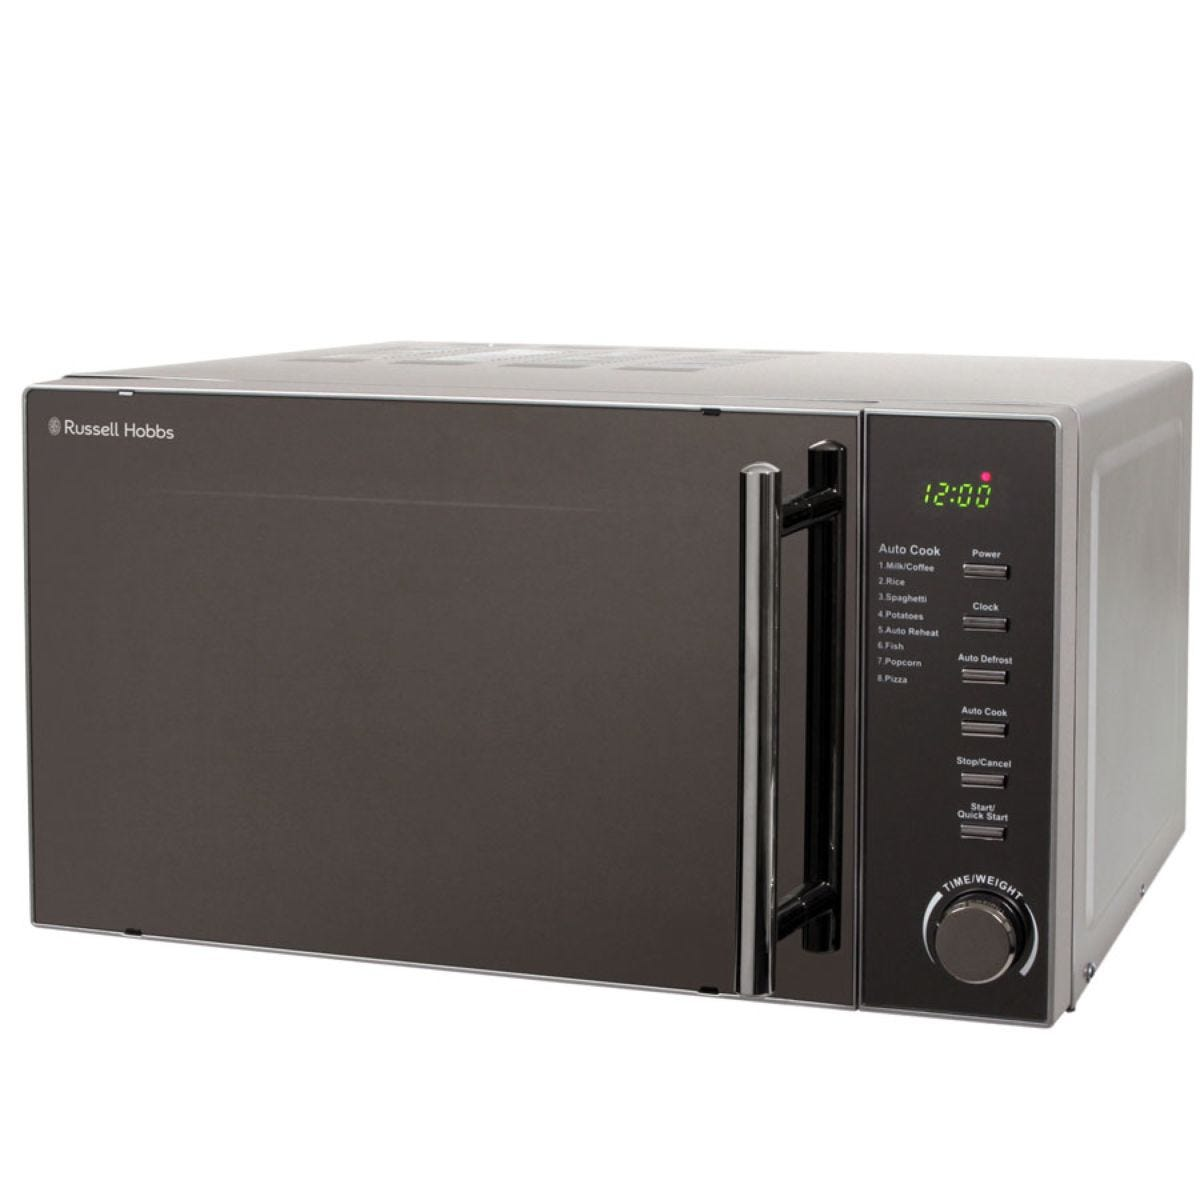 Russell Hobbs RHM2017 800W 20L Digital Microwave – Silver